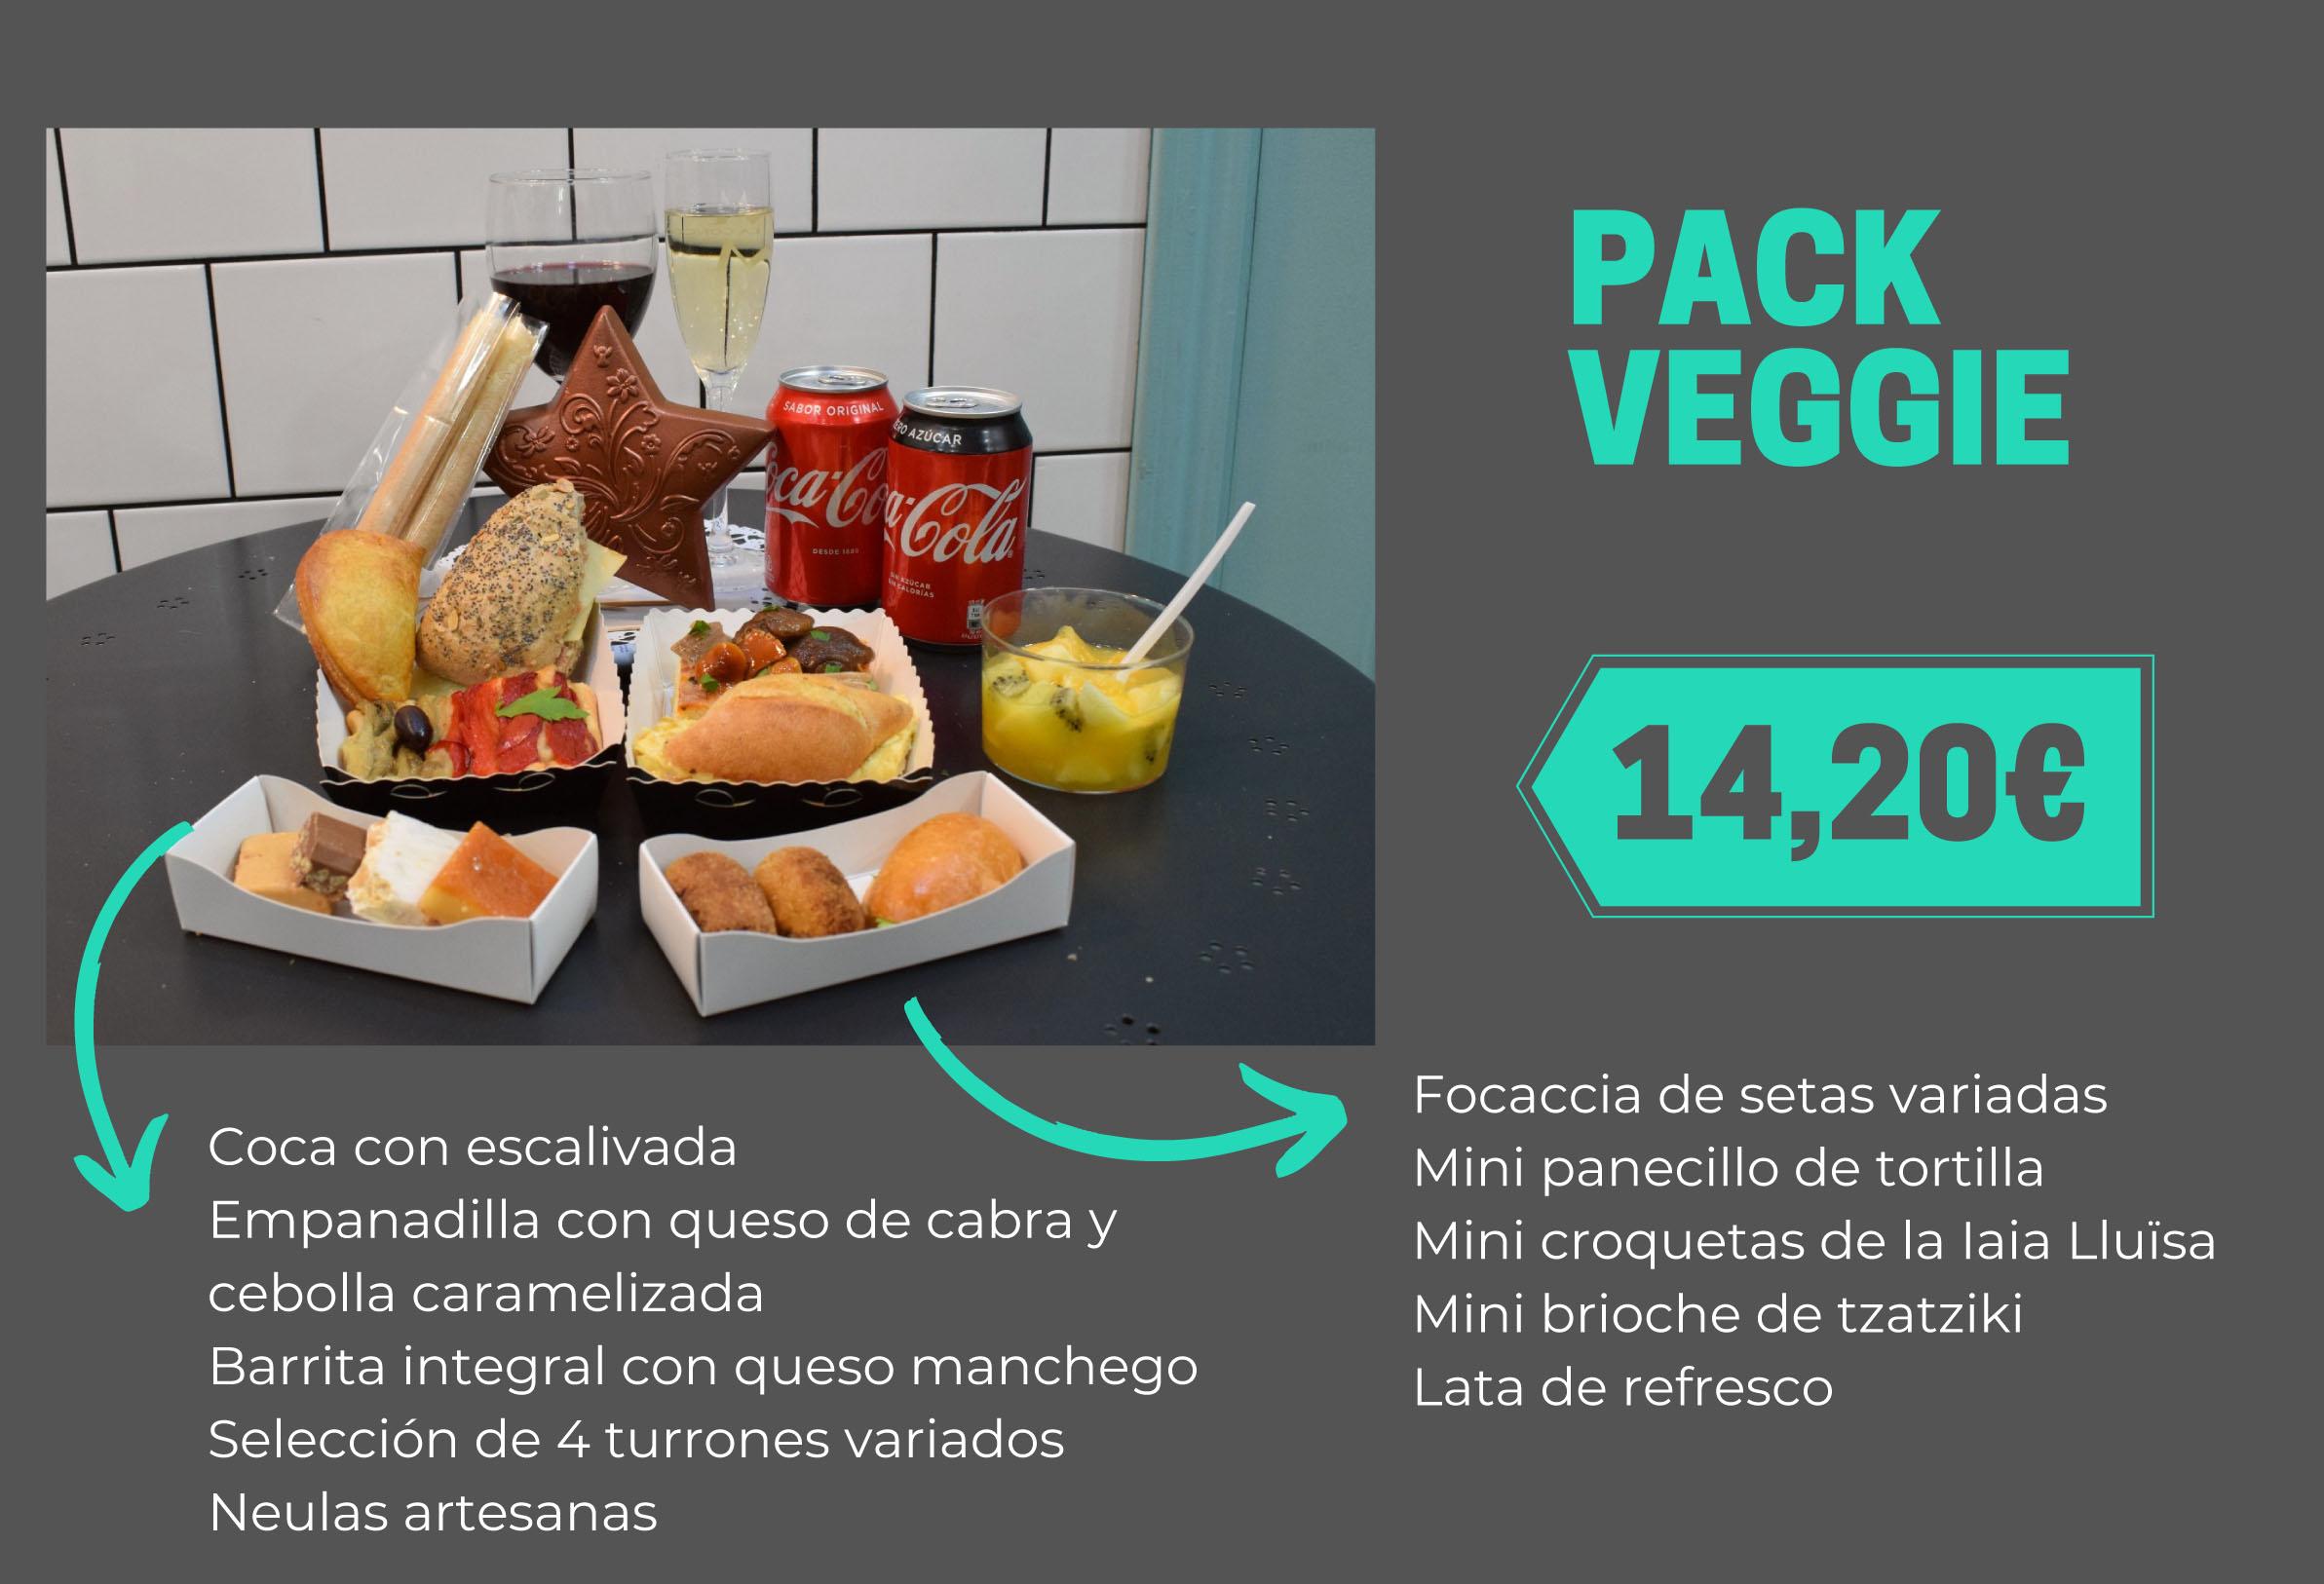 Pack veggie